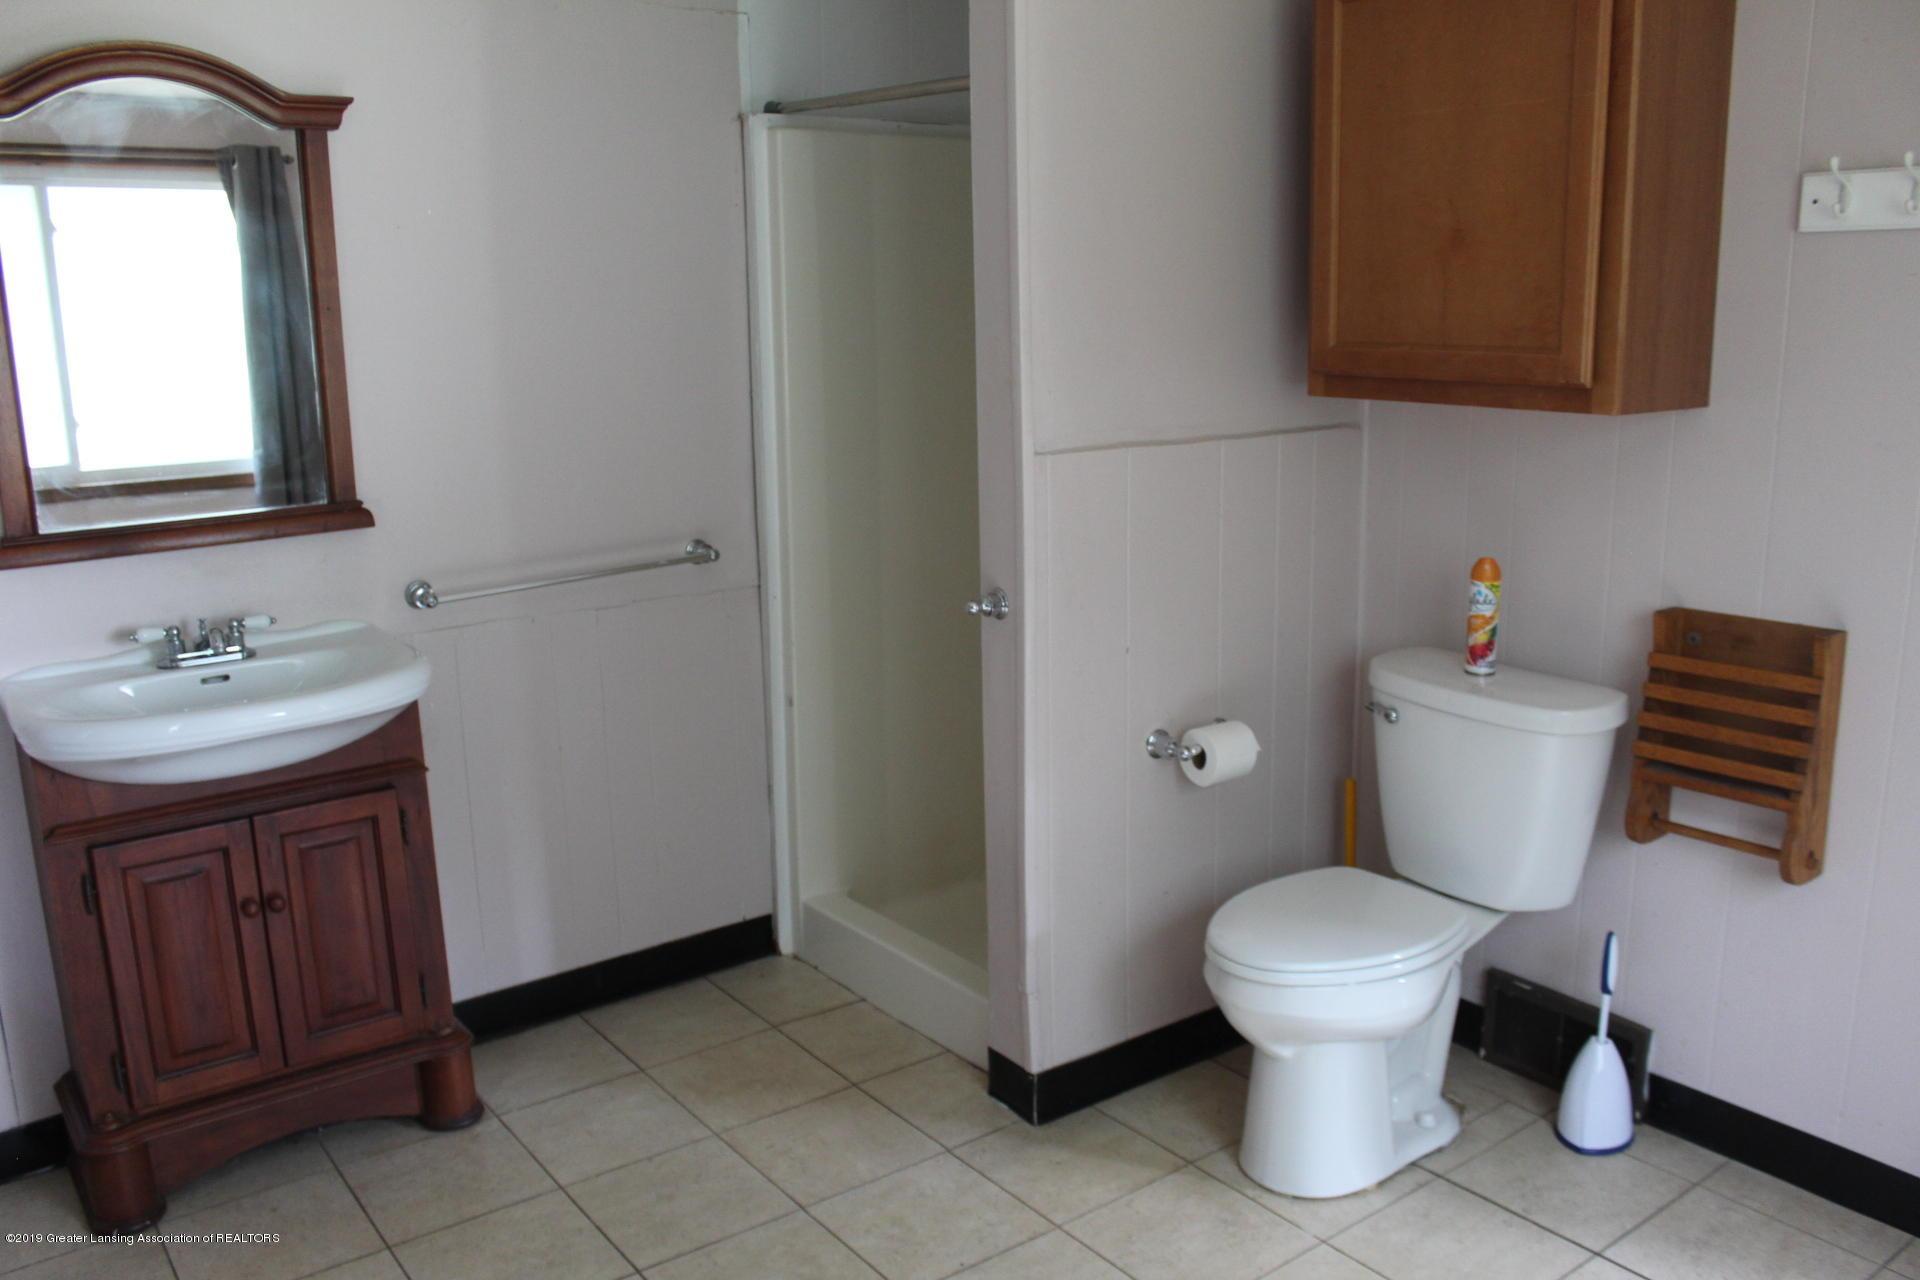 234 N Hagadorn Rd - Bathroom 2 - 9